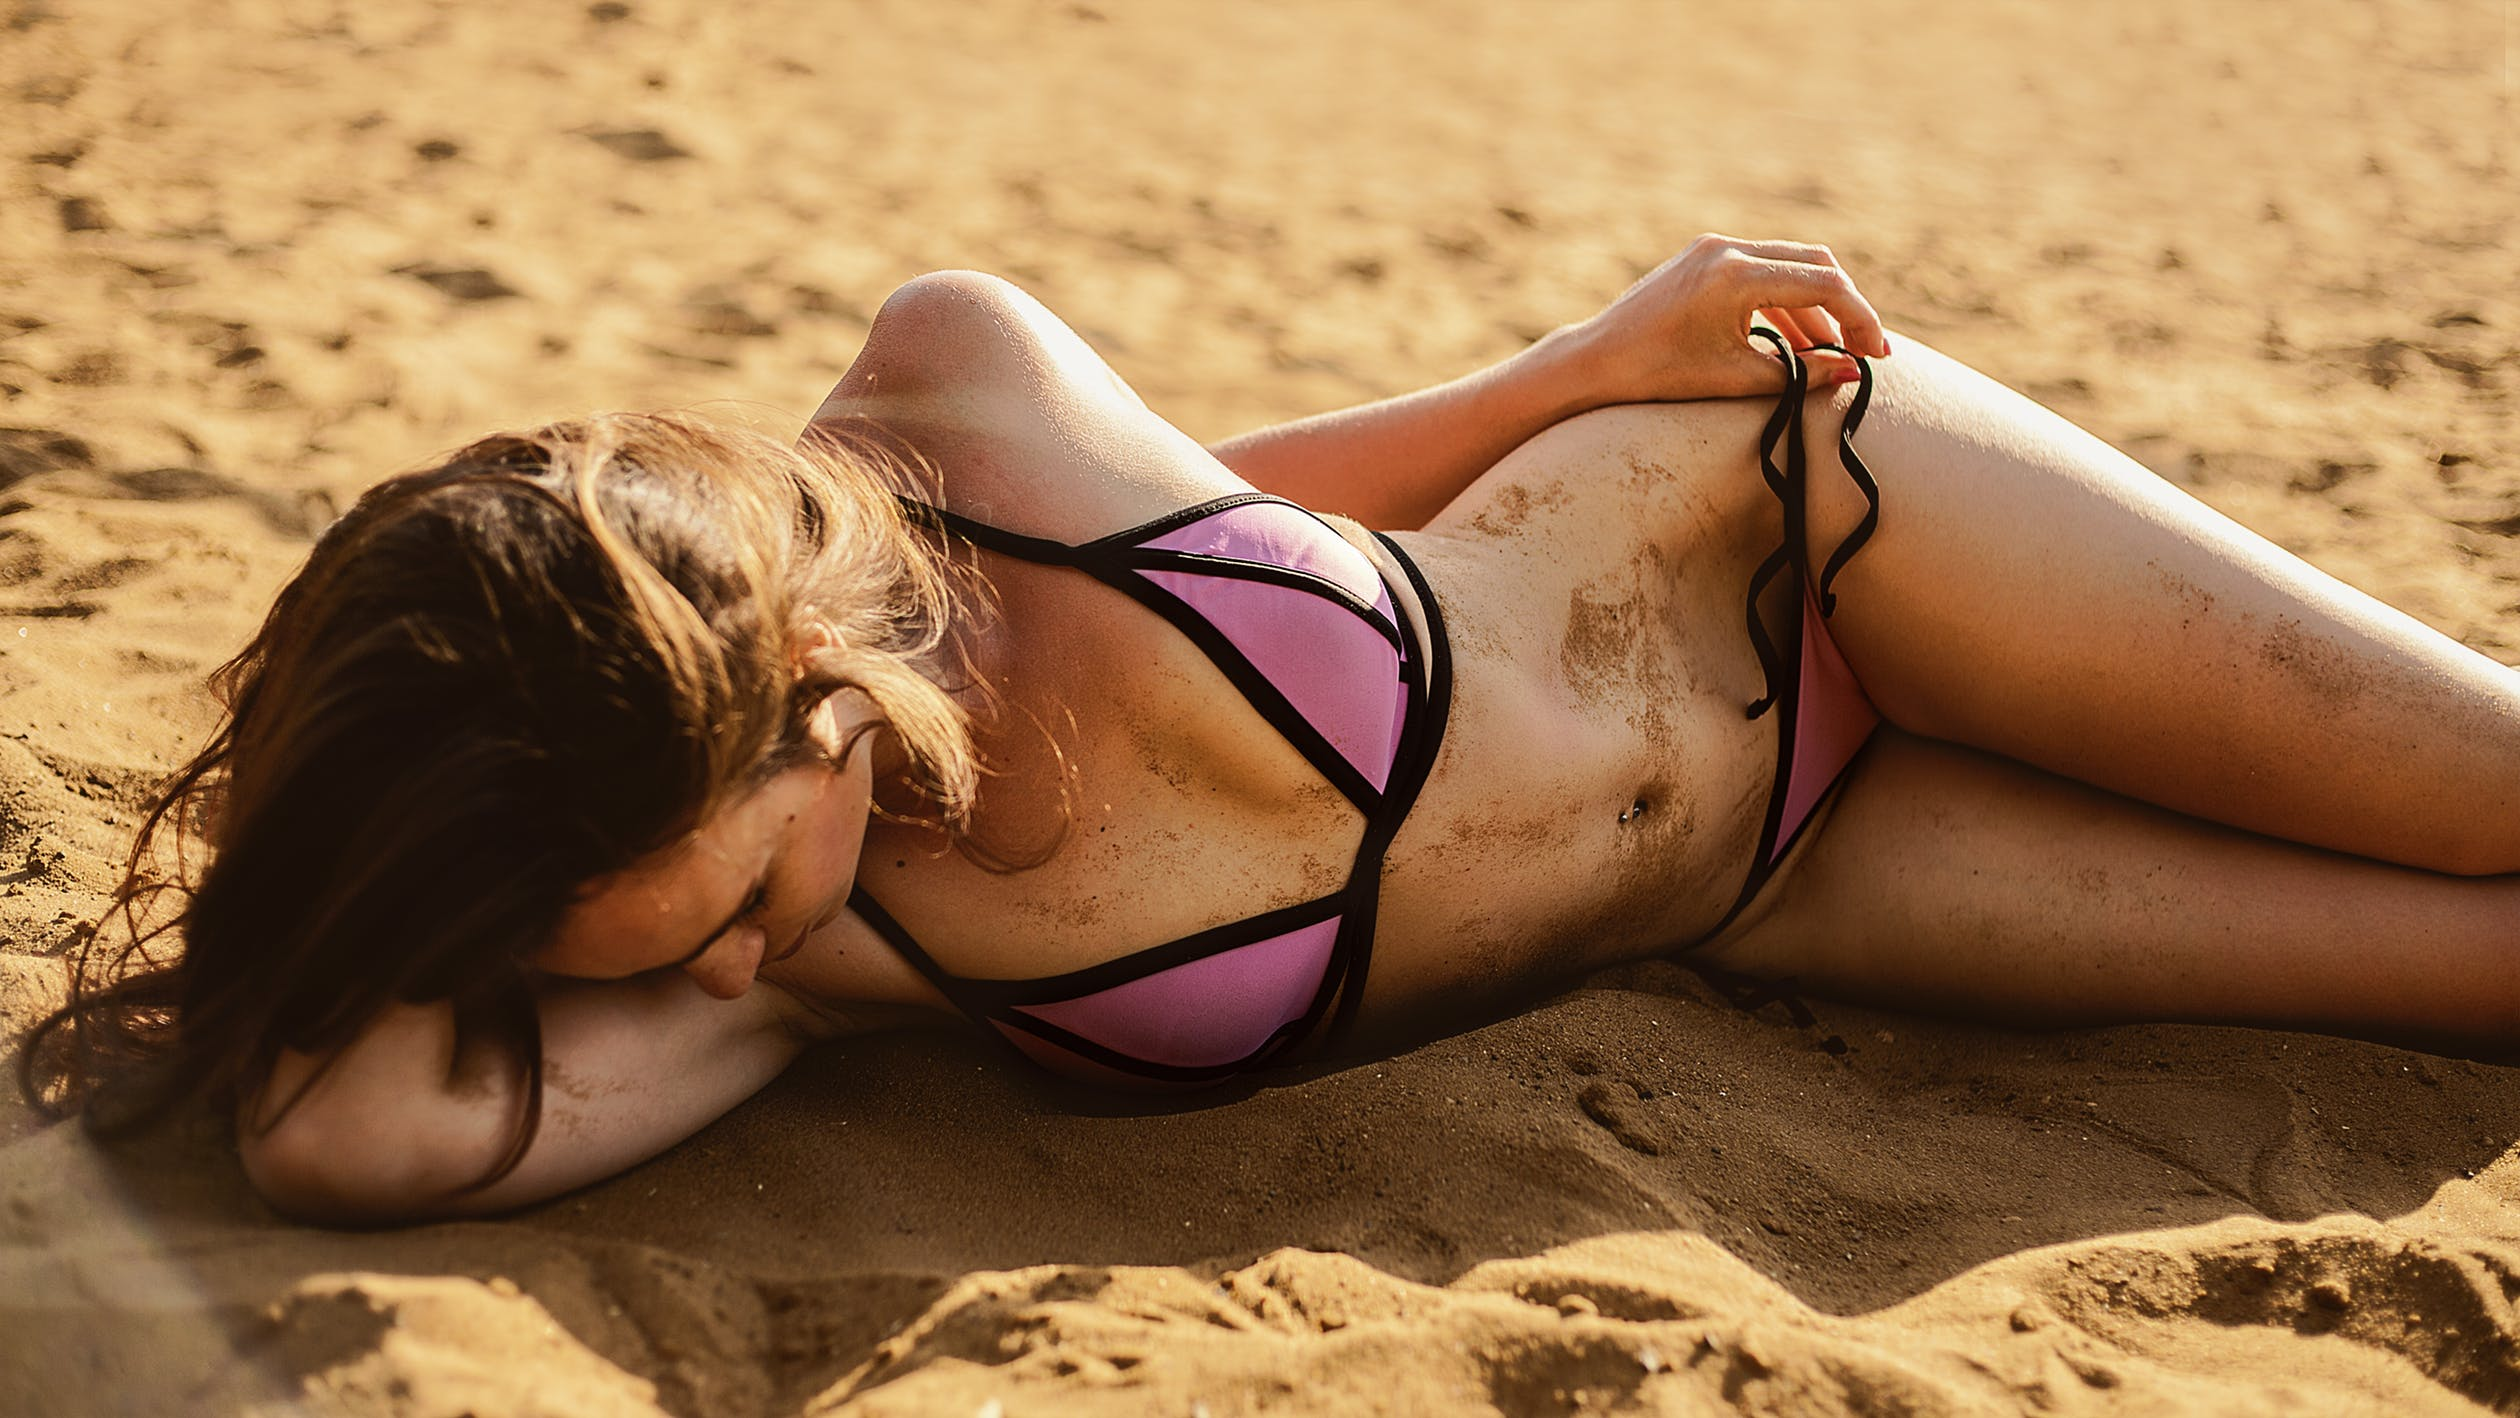 plaisir solitaire sable maillot